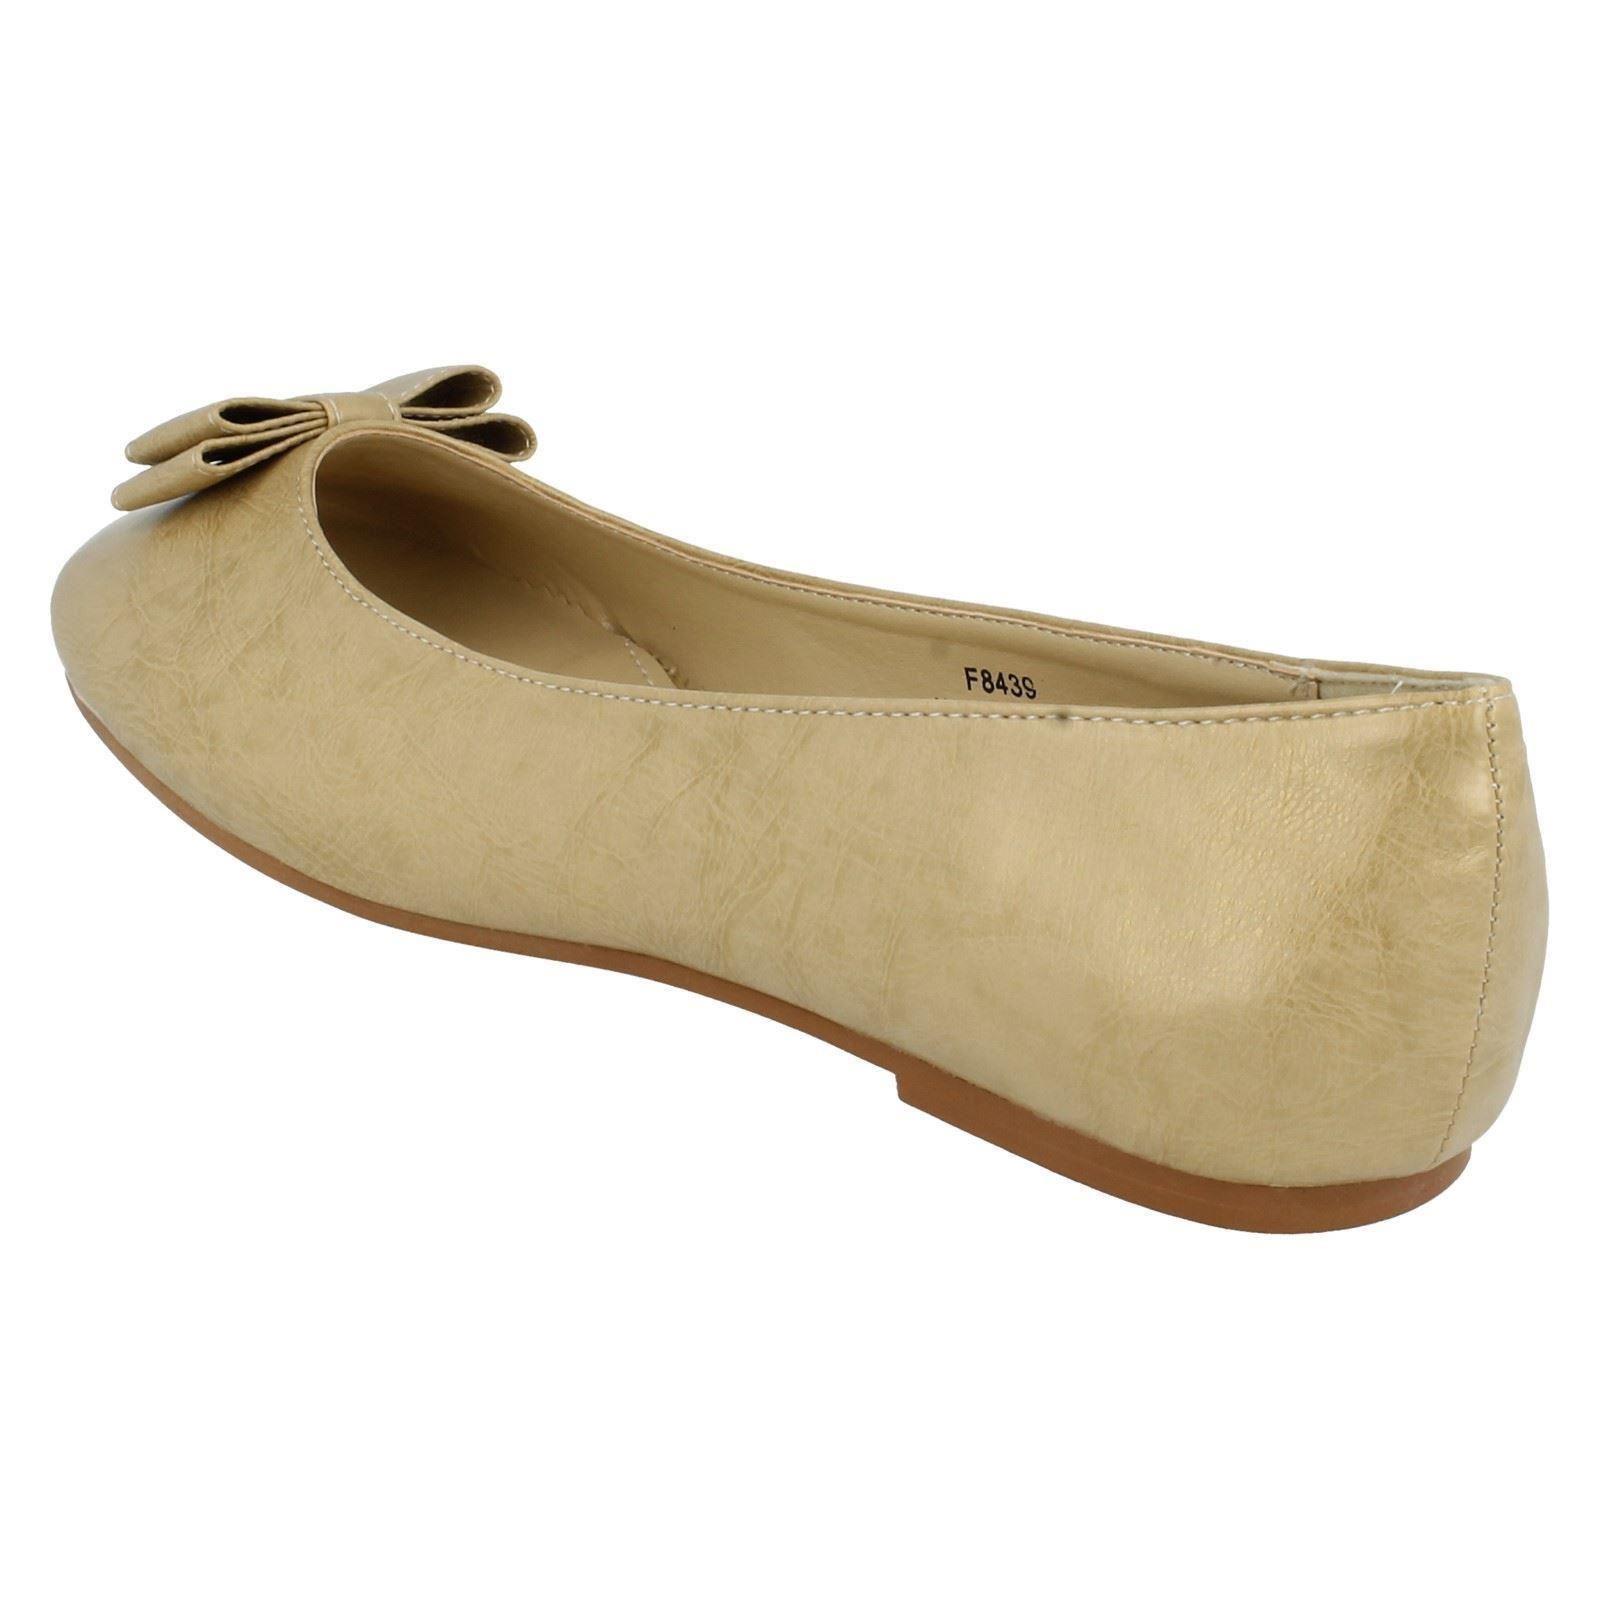 Señoras de punto en zapatos planos Etiqueta f8439